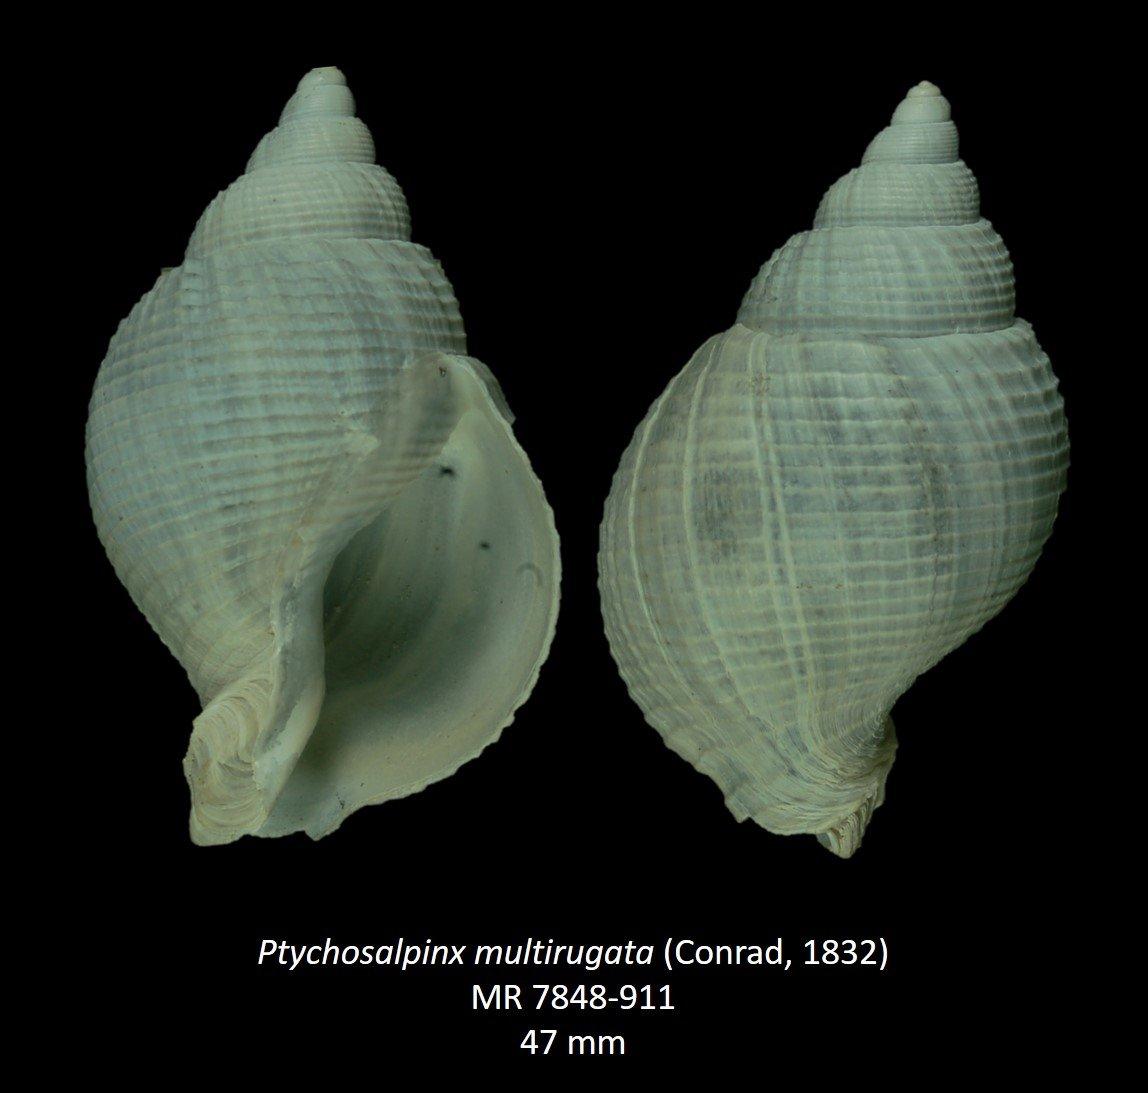 Ptychosalpinx multirugata